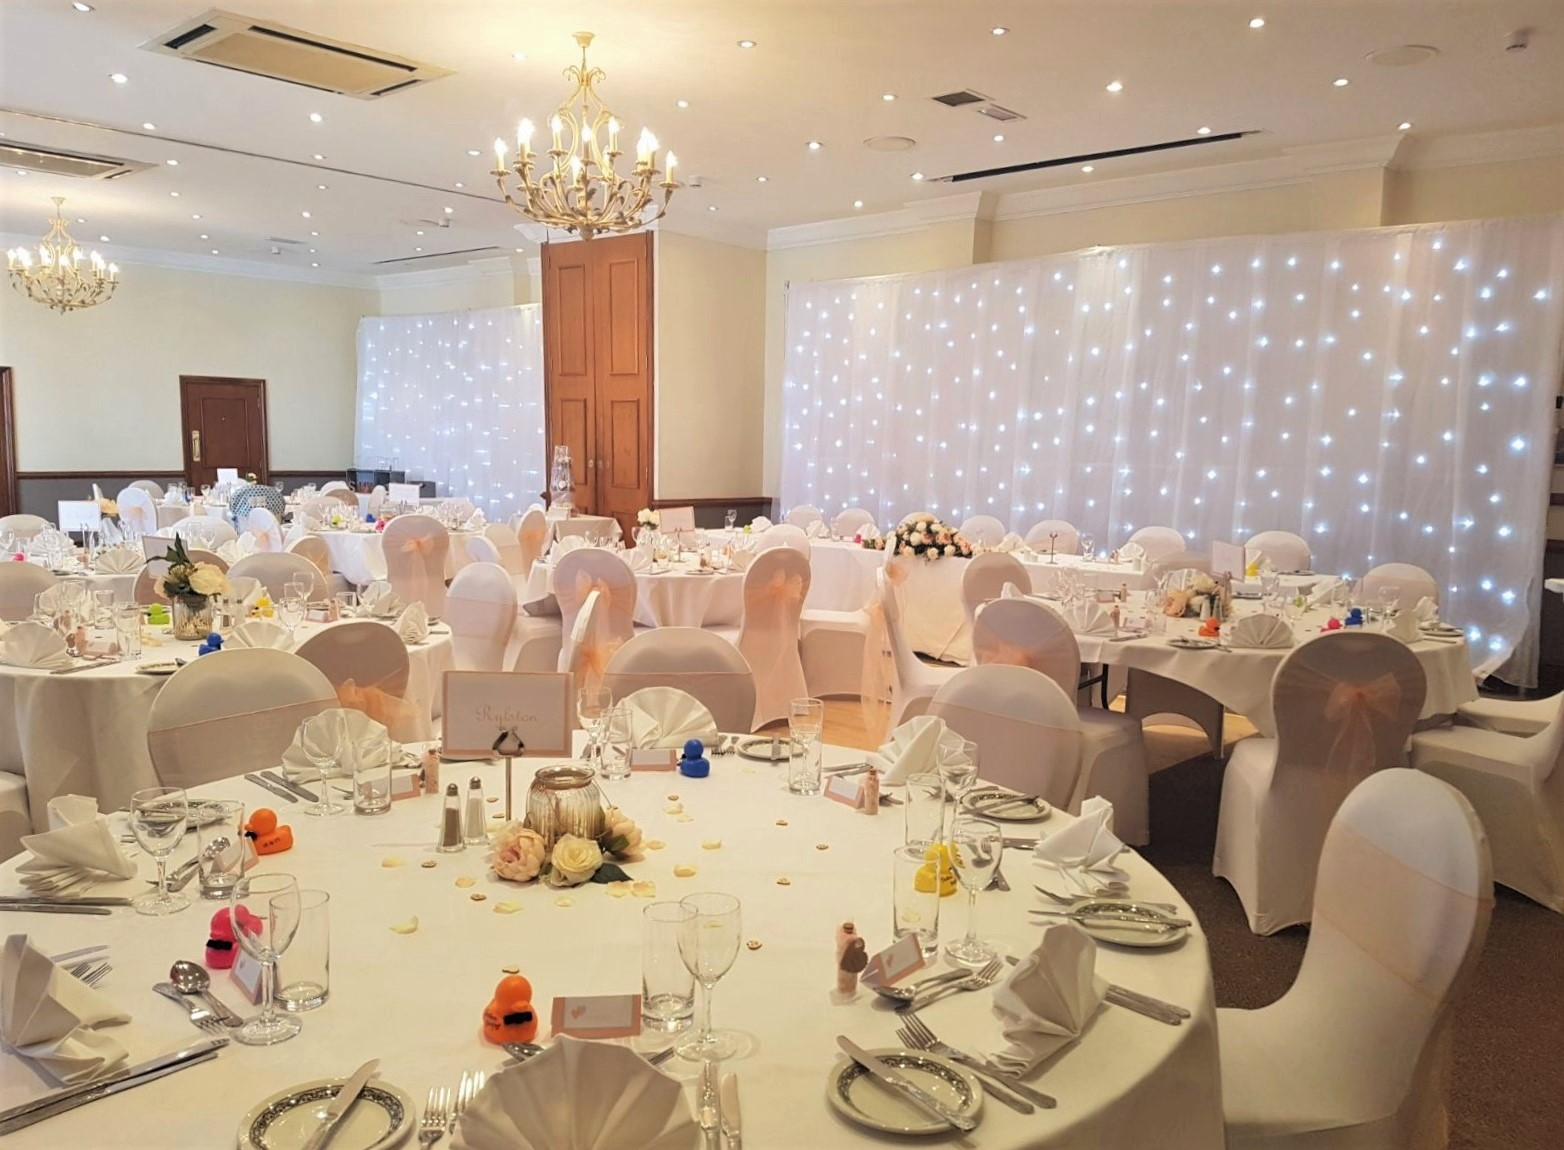 Weybridge Weddings - Reception Room at The Ship Hotel